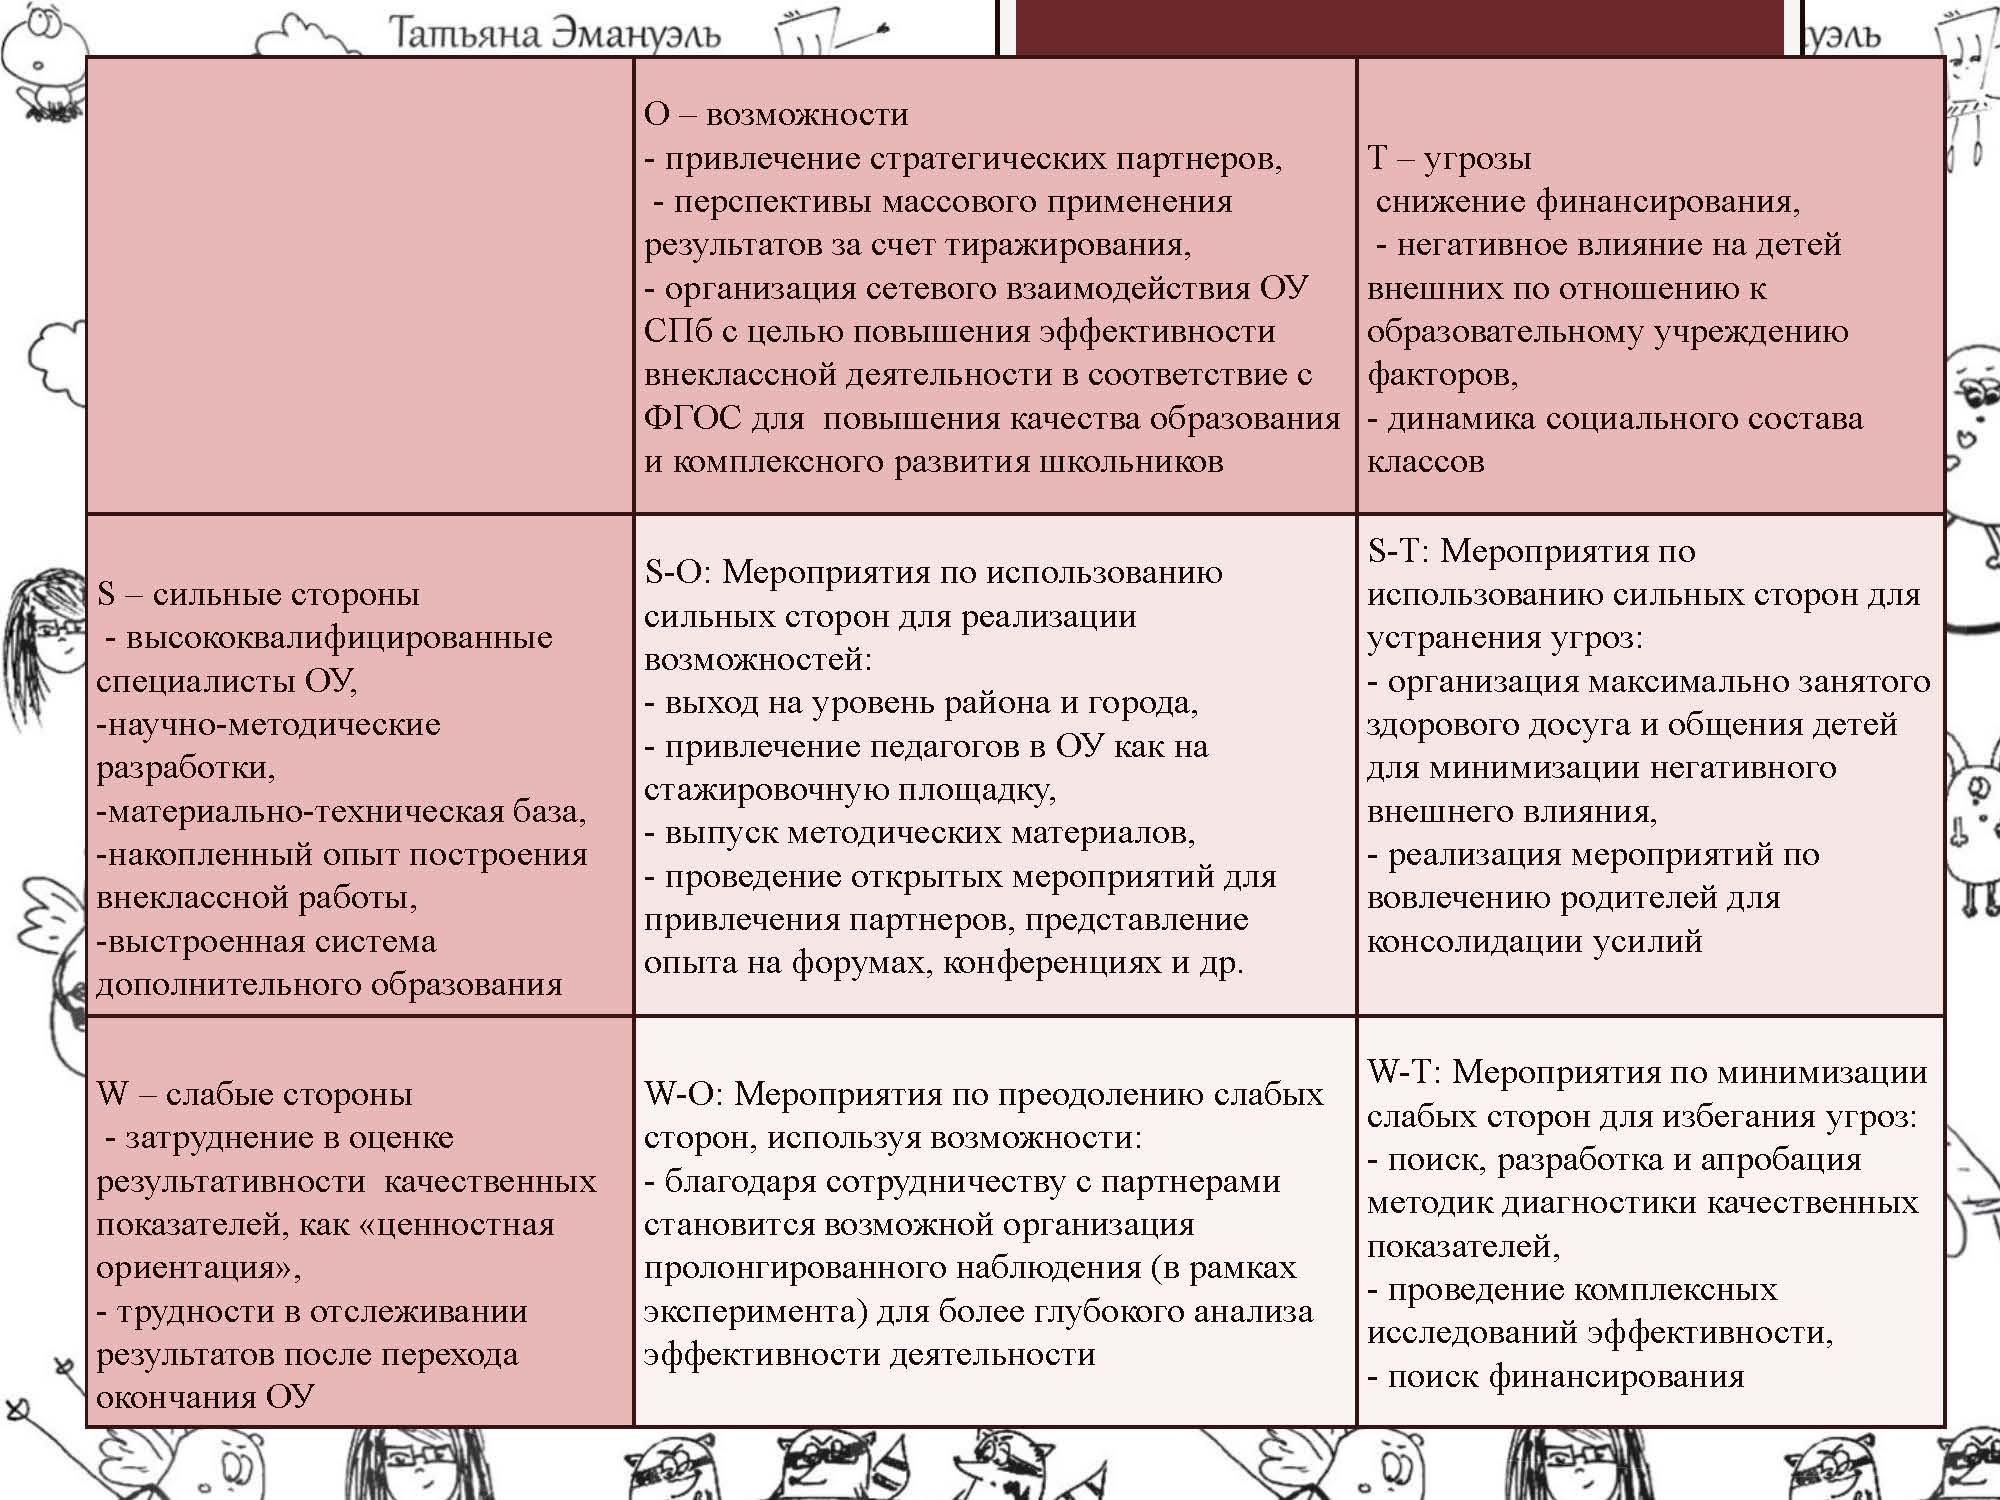 06 февраля эмануэль_Страница_041